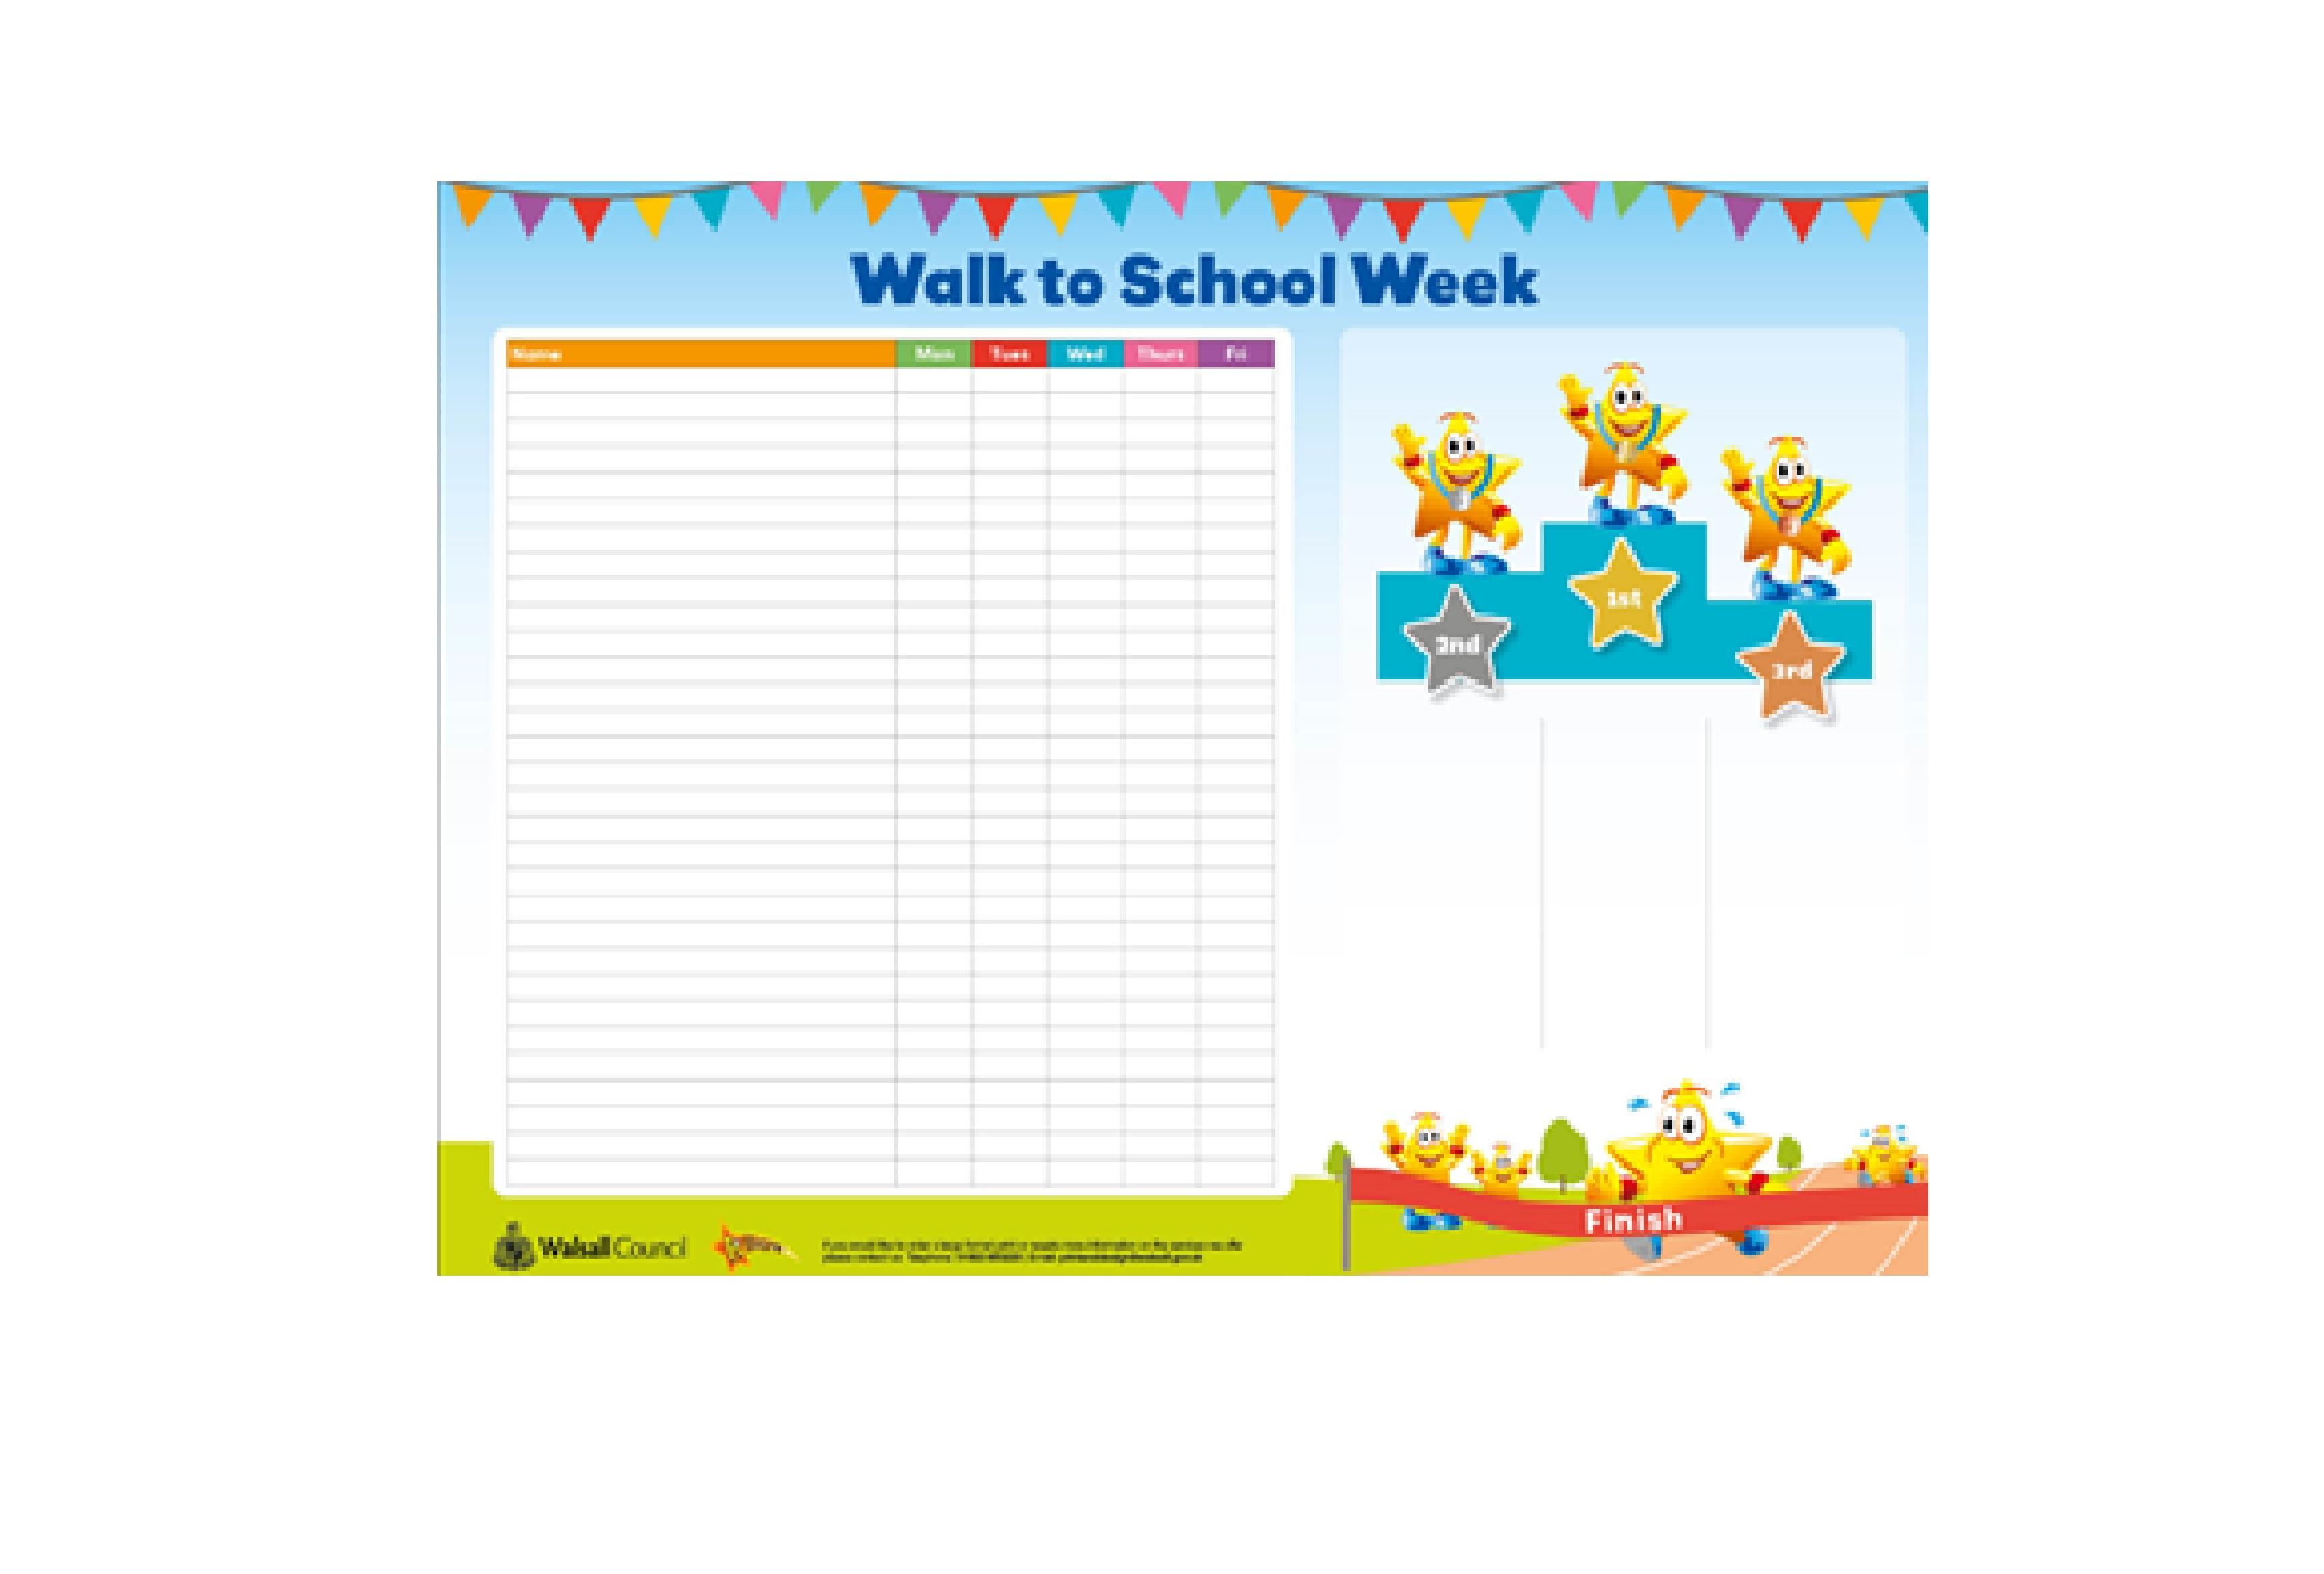 2021 Walk to School Week